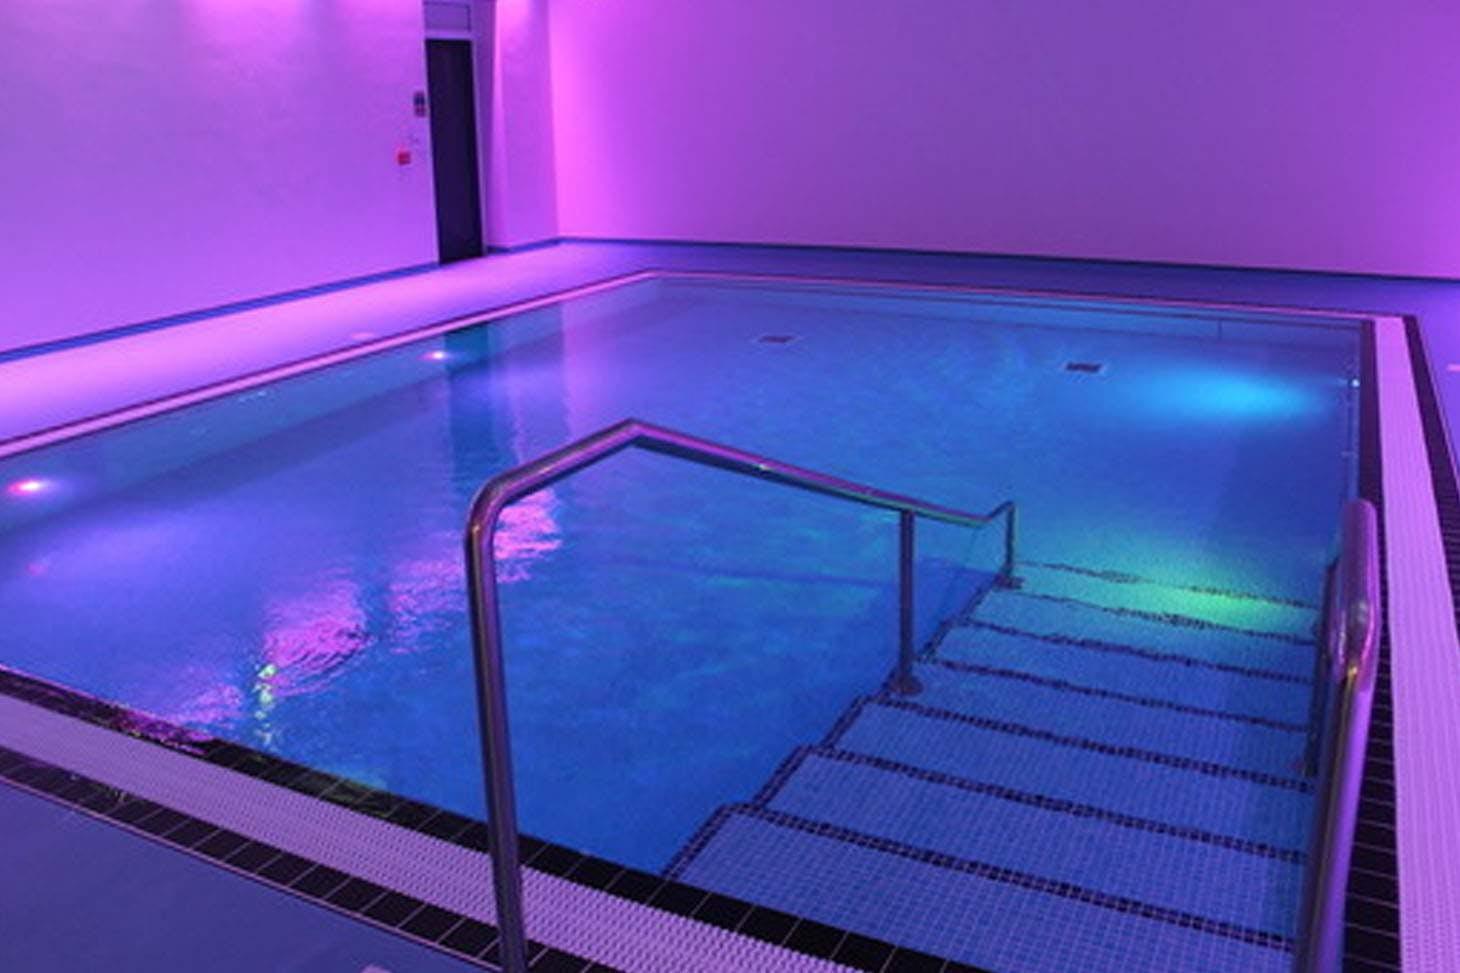 Sir Tom Finney Community High School Indoor swimming pool